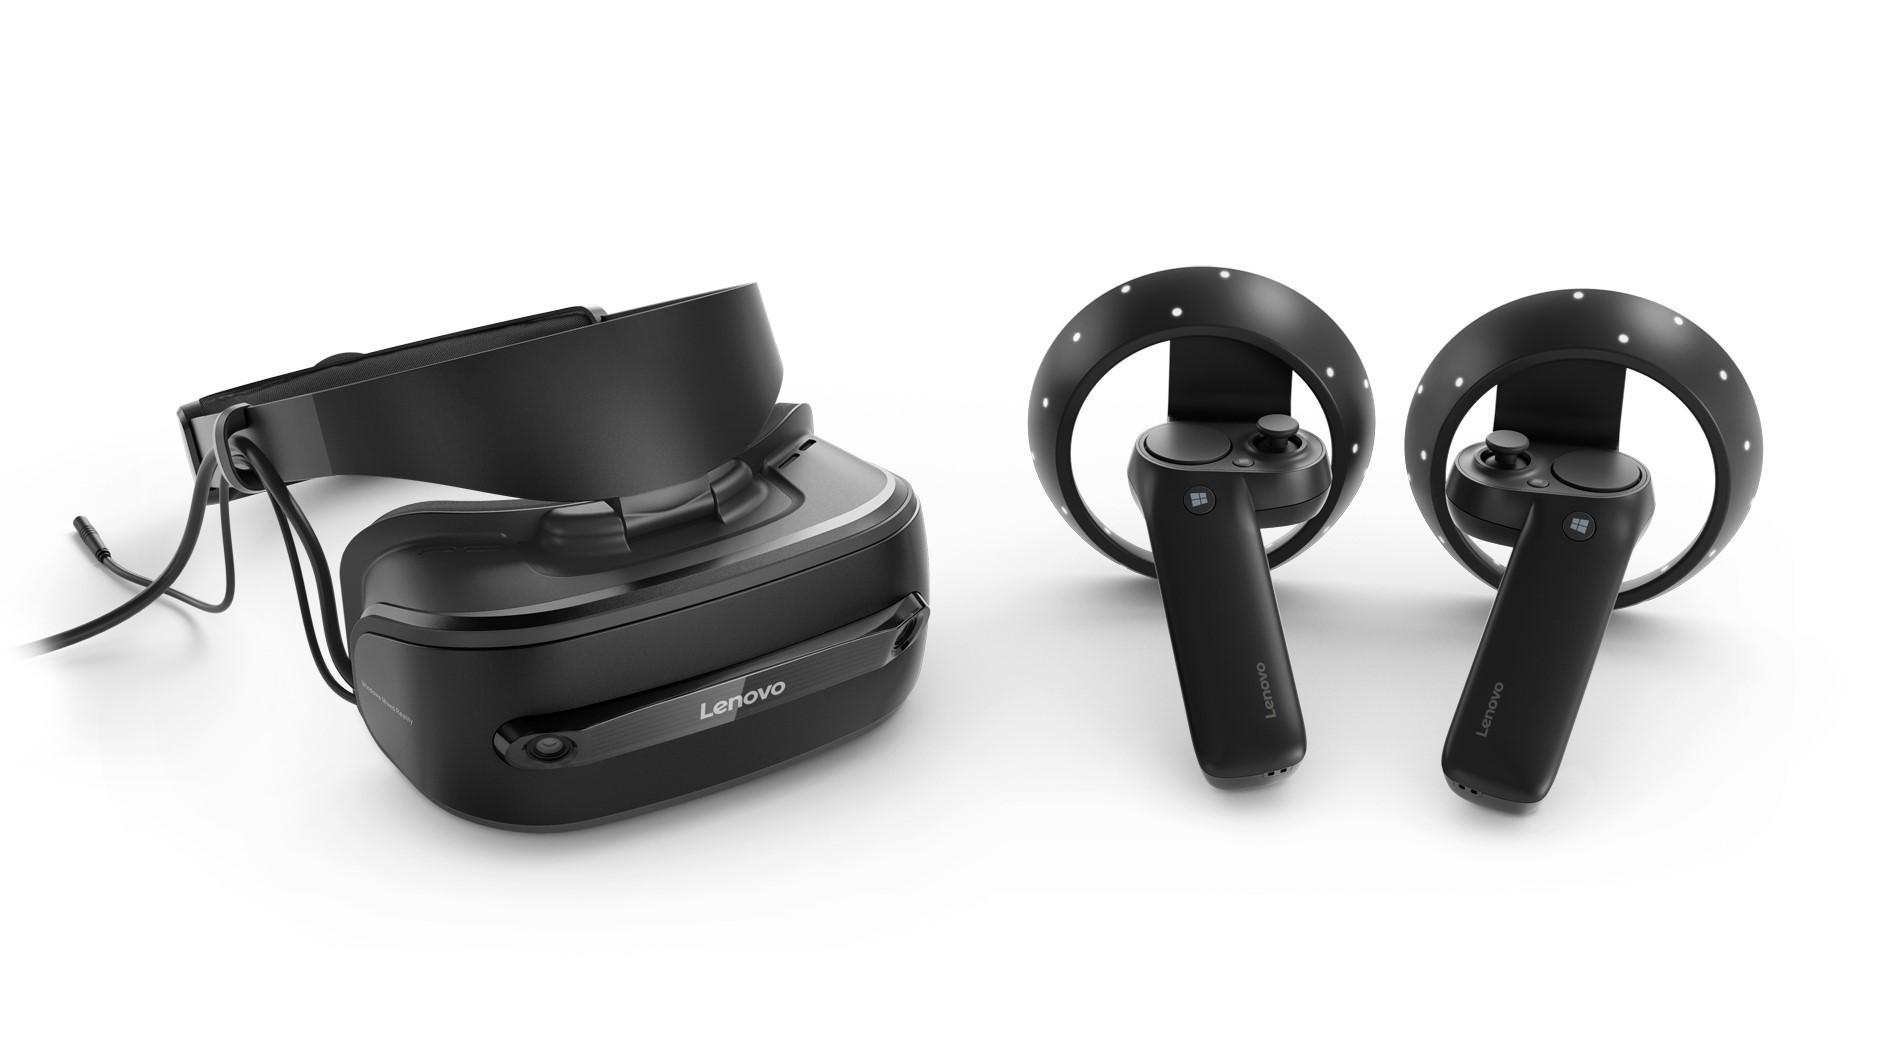 Walmart Deal Brings Lenovo Explorer Headset + Controller